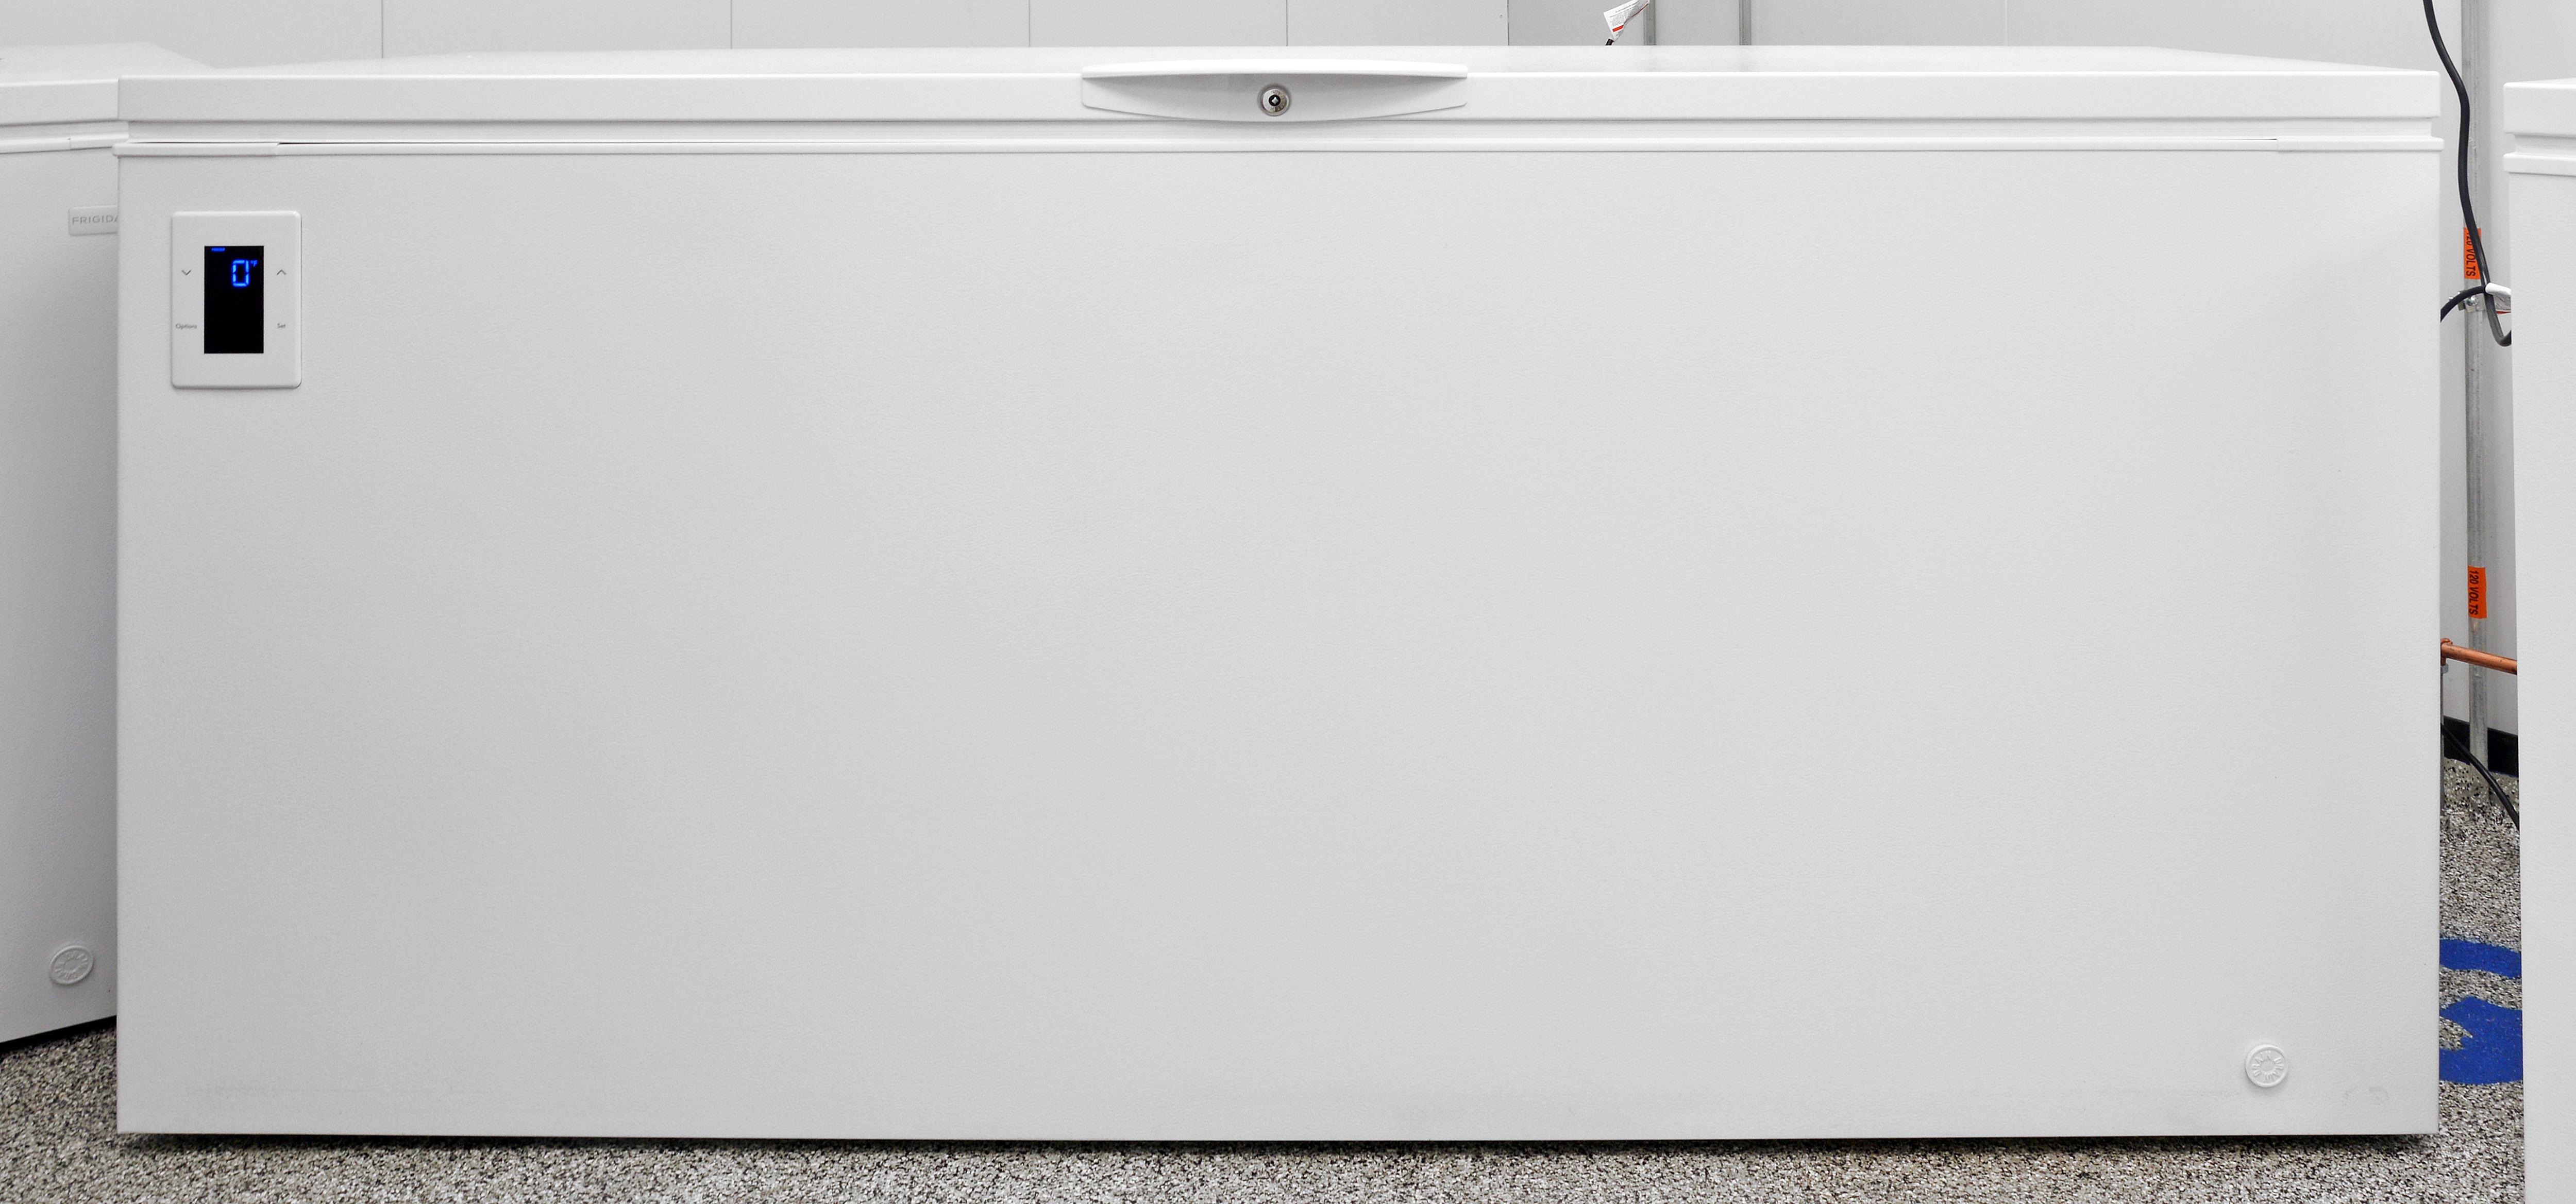 Kenmore Elite 17202 Freezer Review Reviewed Com Freezers